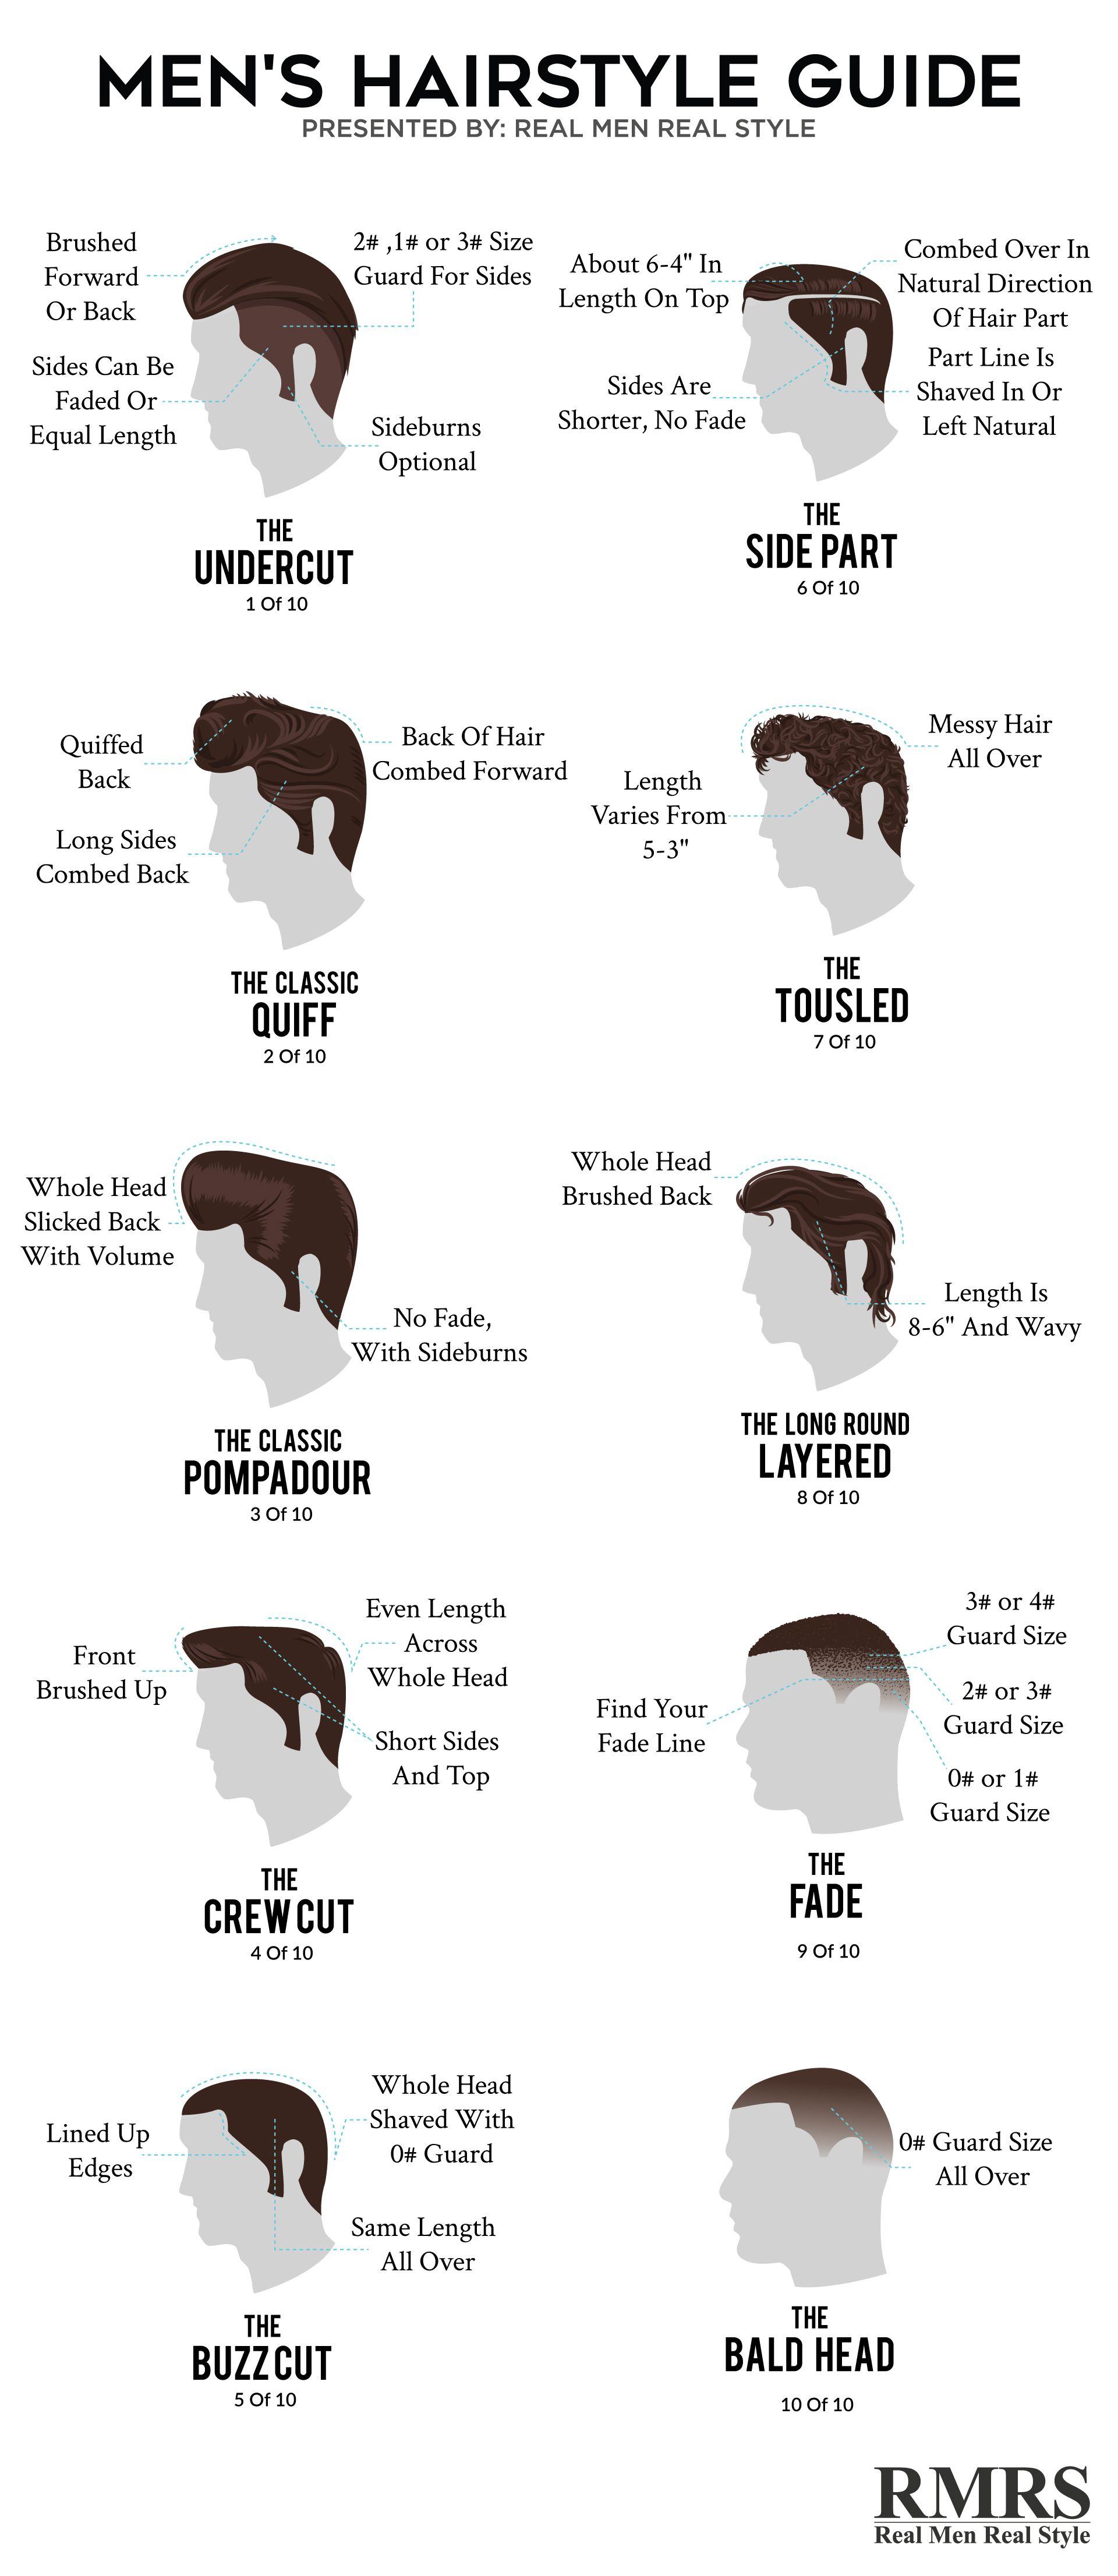 The 10 Best Hair Styles For Men Attraction A Man S Hair Style Video Hair Guide Medium Length Hair Men Mens Hairstyles Medium